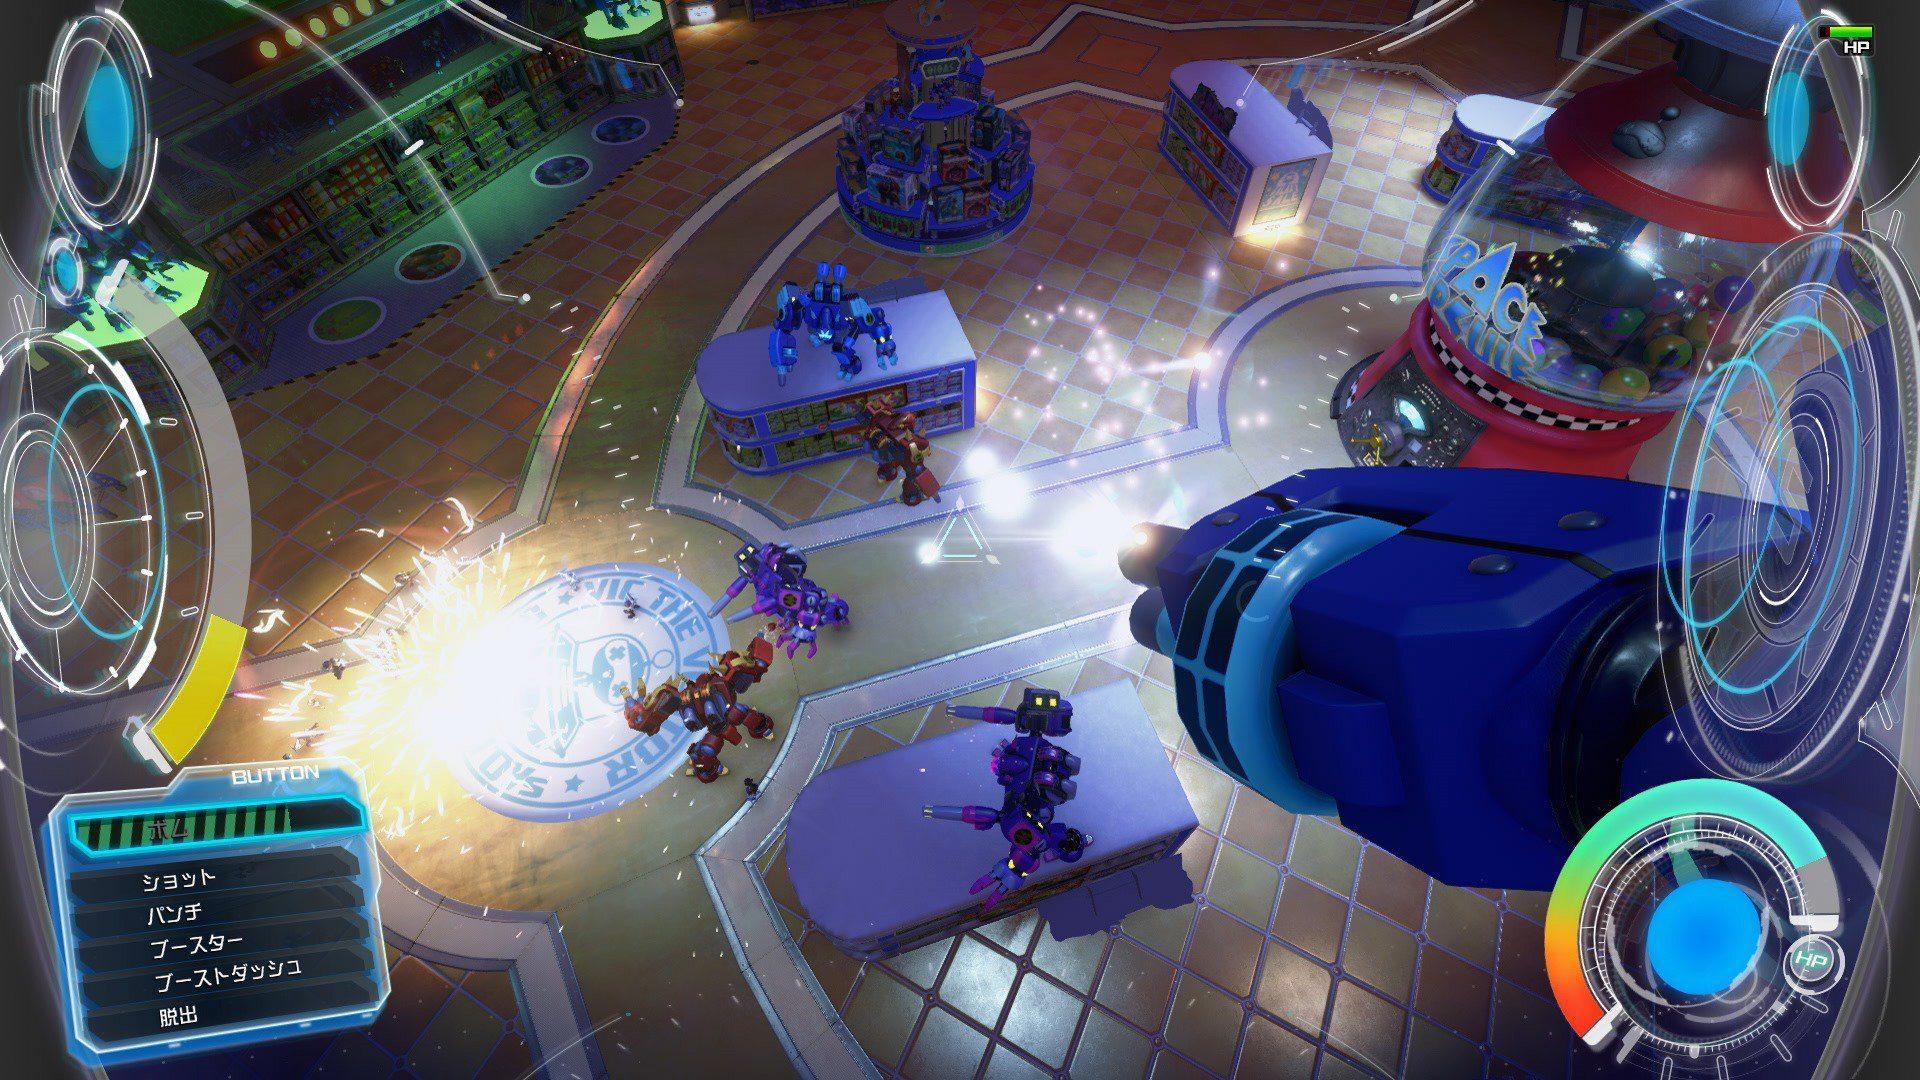 Kingdom Hearts 3 Screenshots News Shots Of Toy Story Hercules